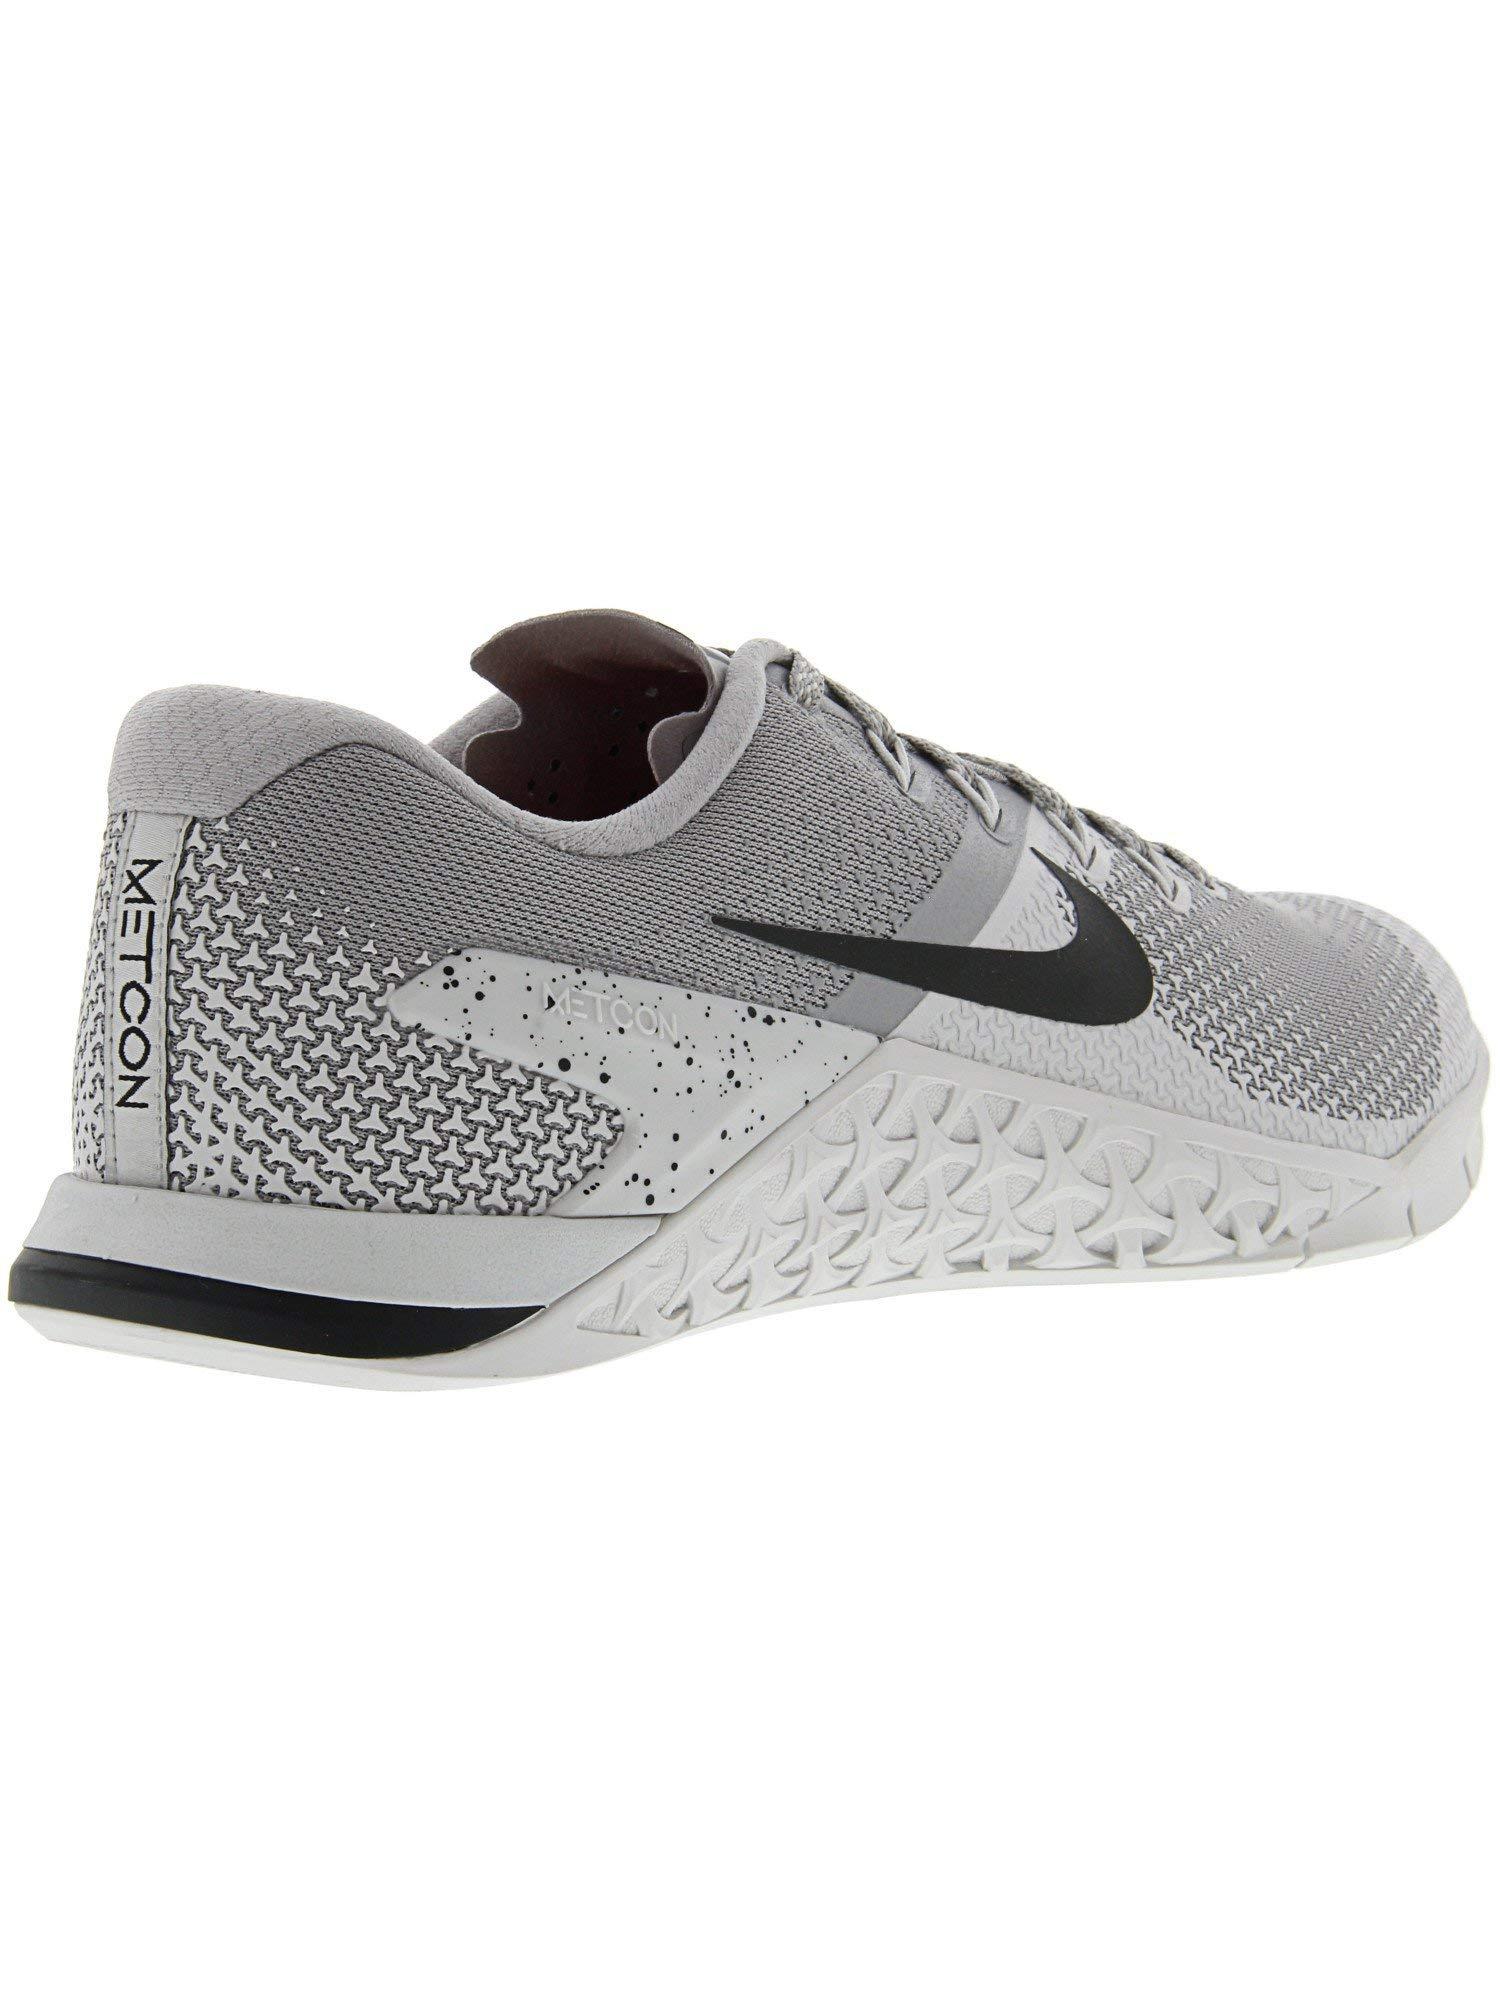 Nike Men's Metcon 4 Atmosphere Grey/Black Ankle-High Cross Trainer Shoe - 7M by Nike (Image #5)